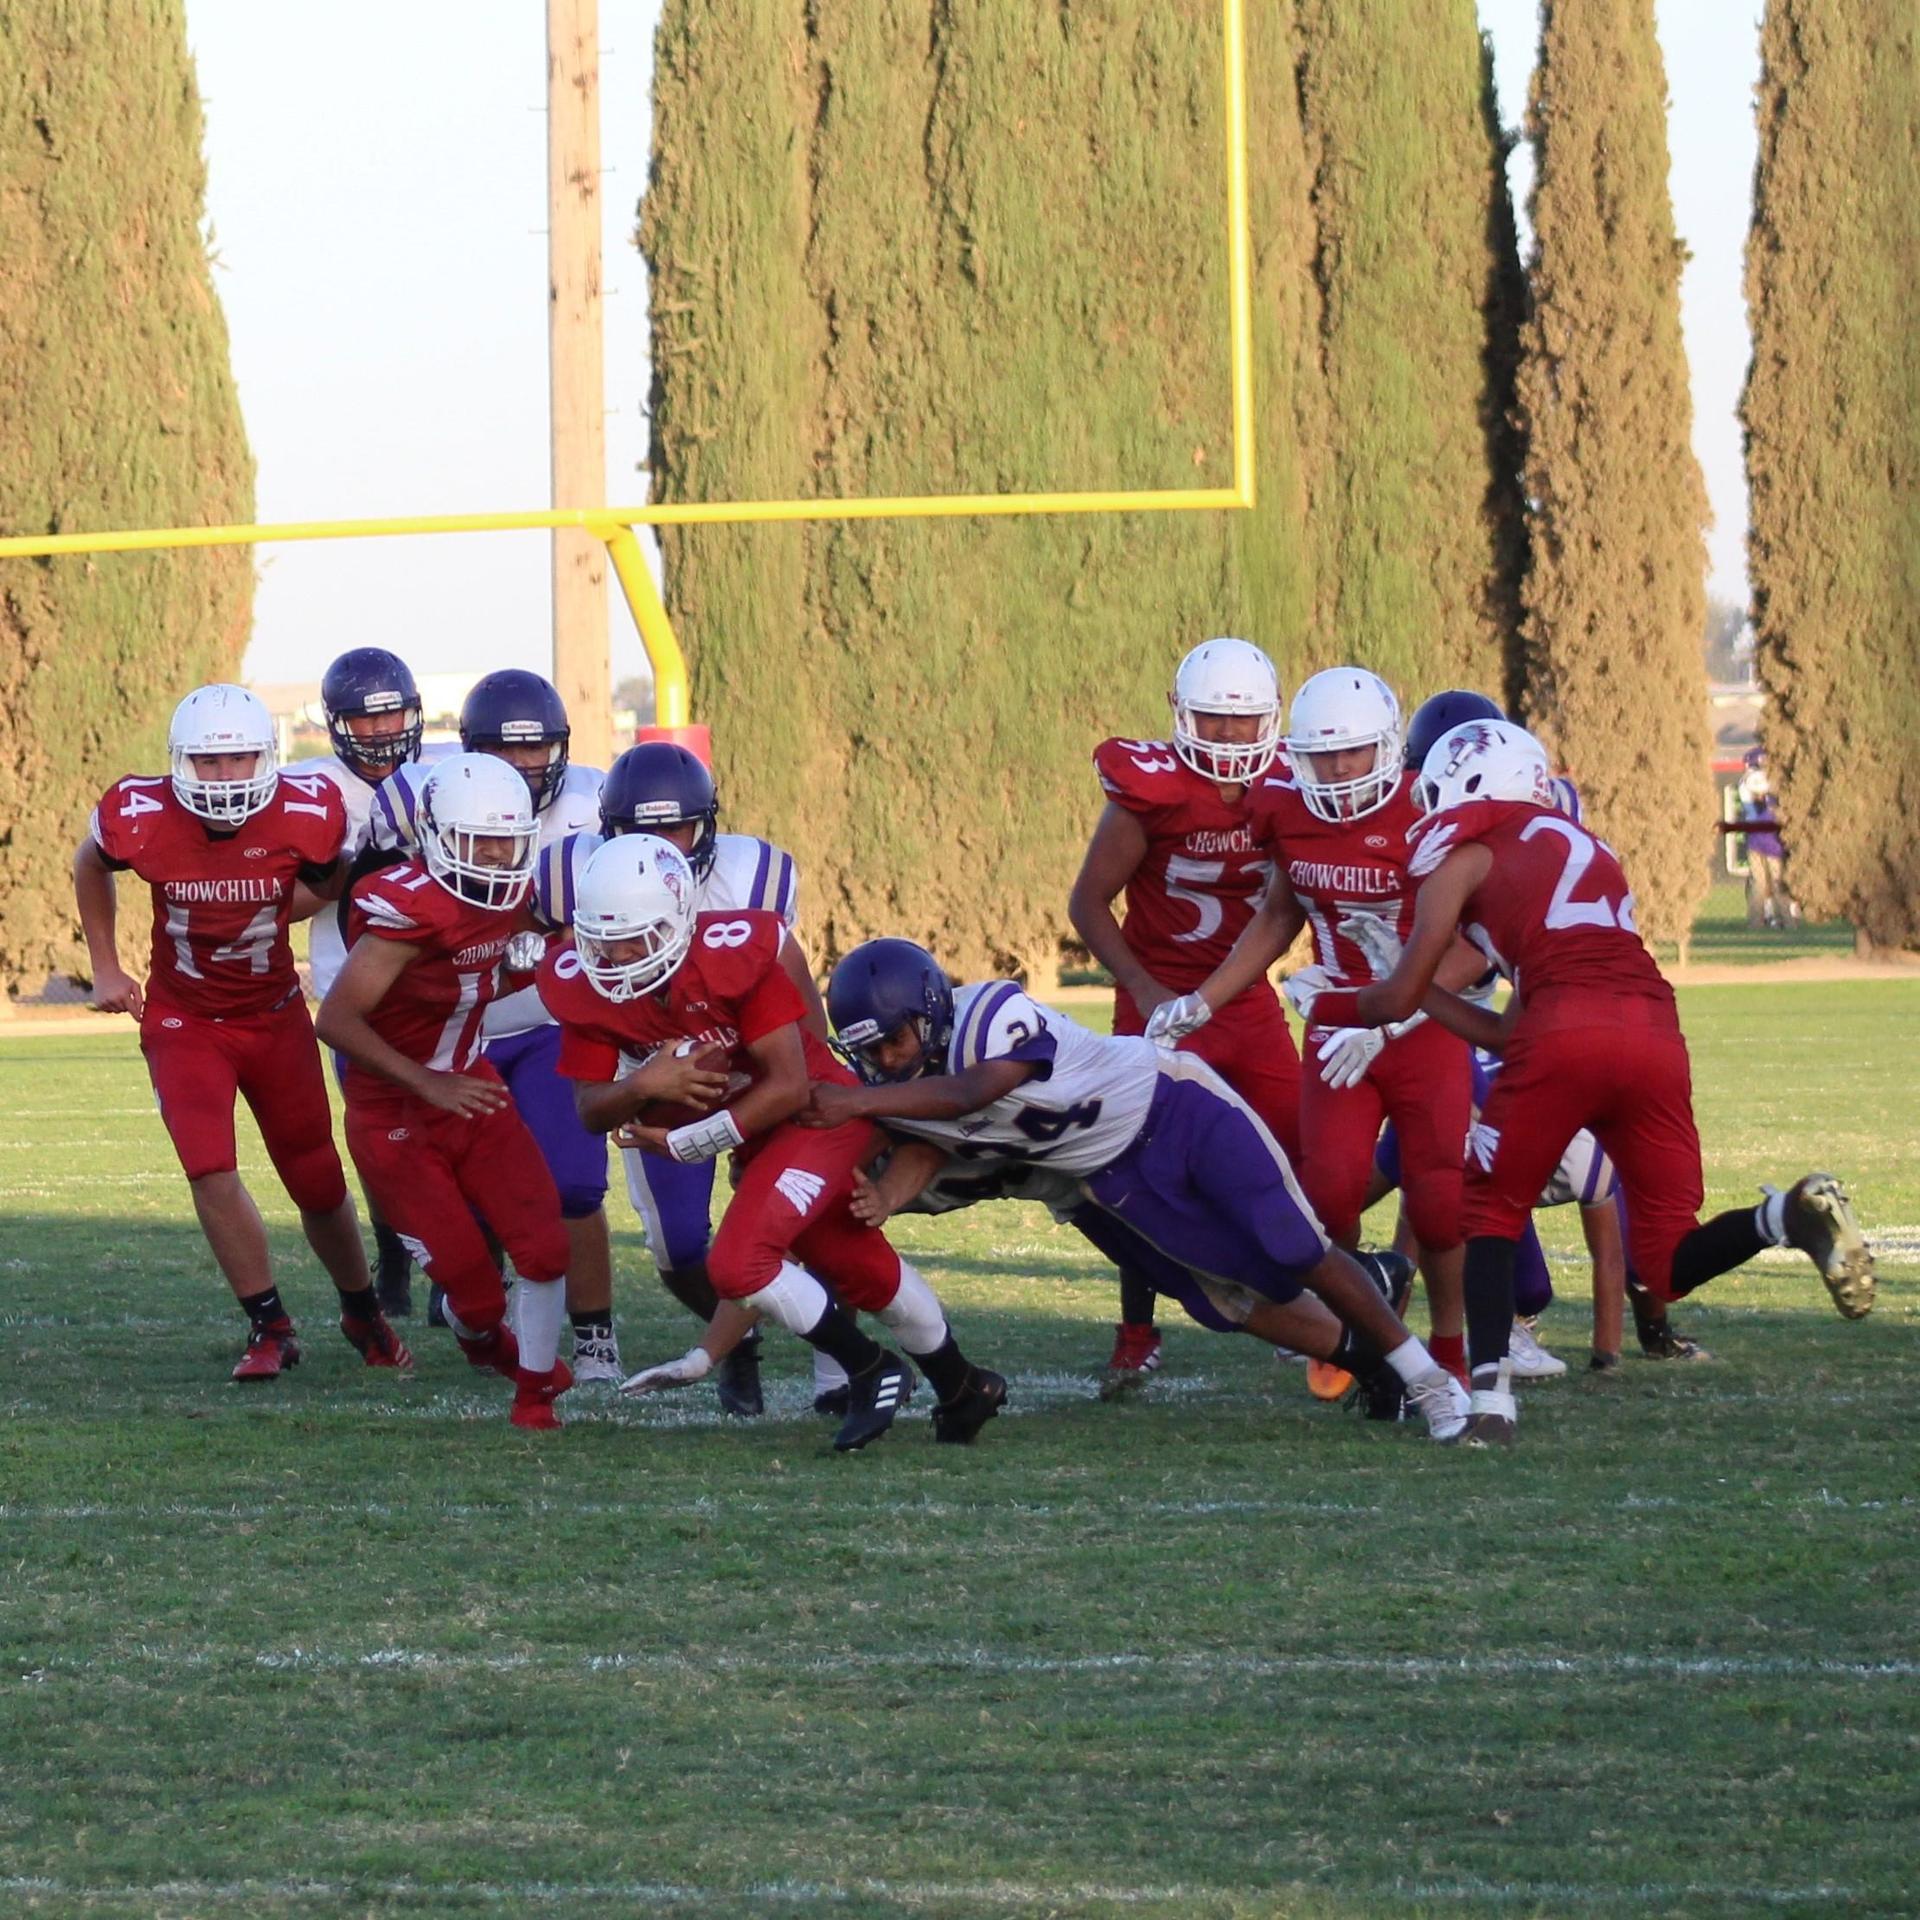 Junior Varsity boys playing football